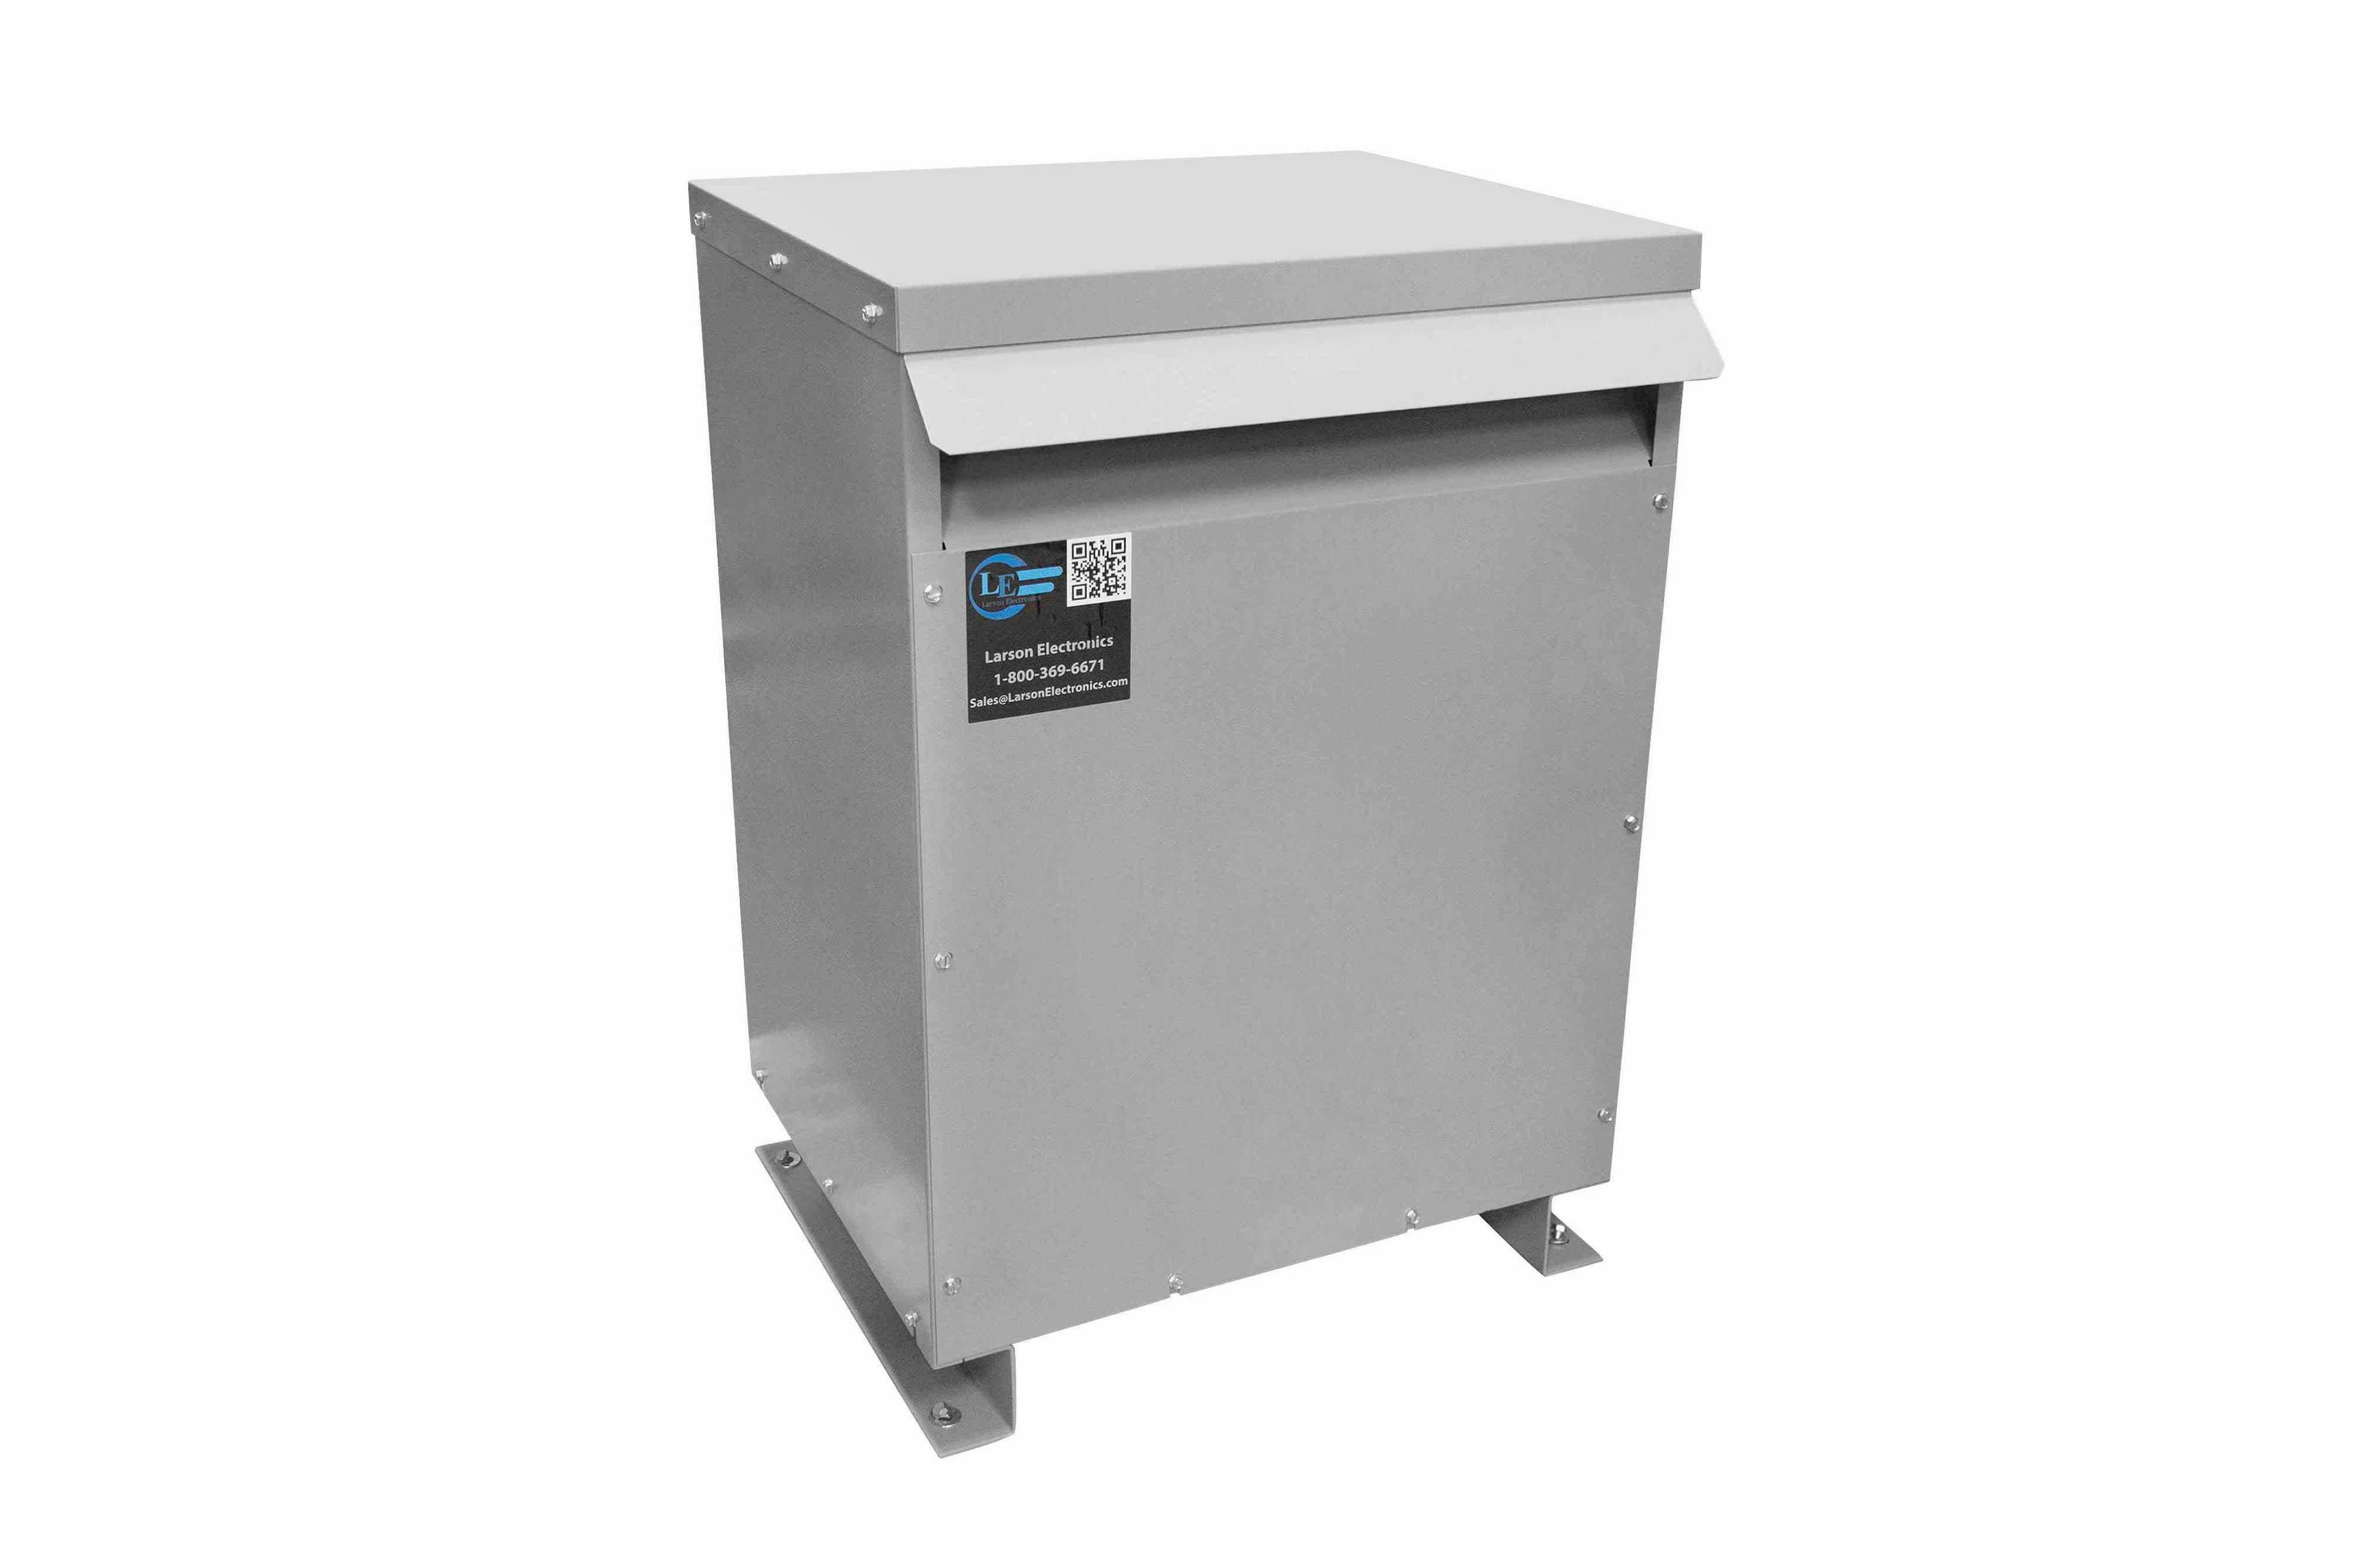 175 kVA 3PH Isolation Transformer, 208V Wye Primary, 415V Delta Secondary, N3R, Ventilated, 60 Hz